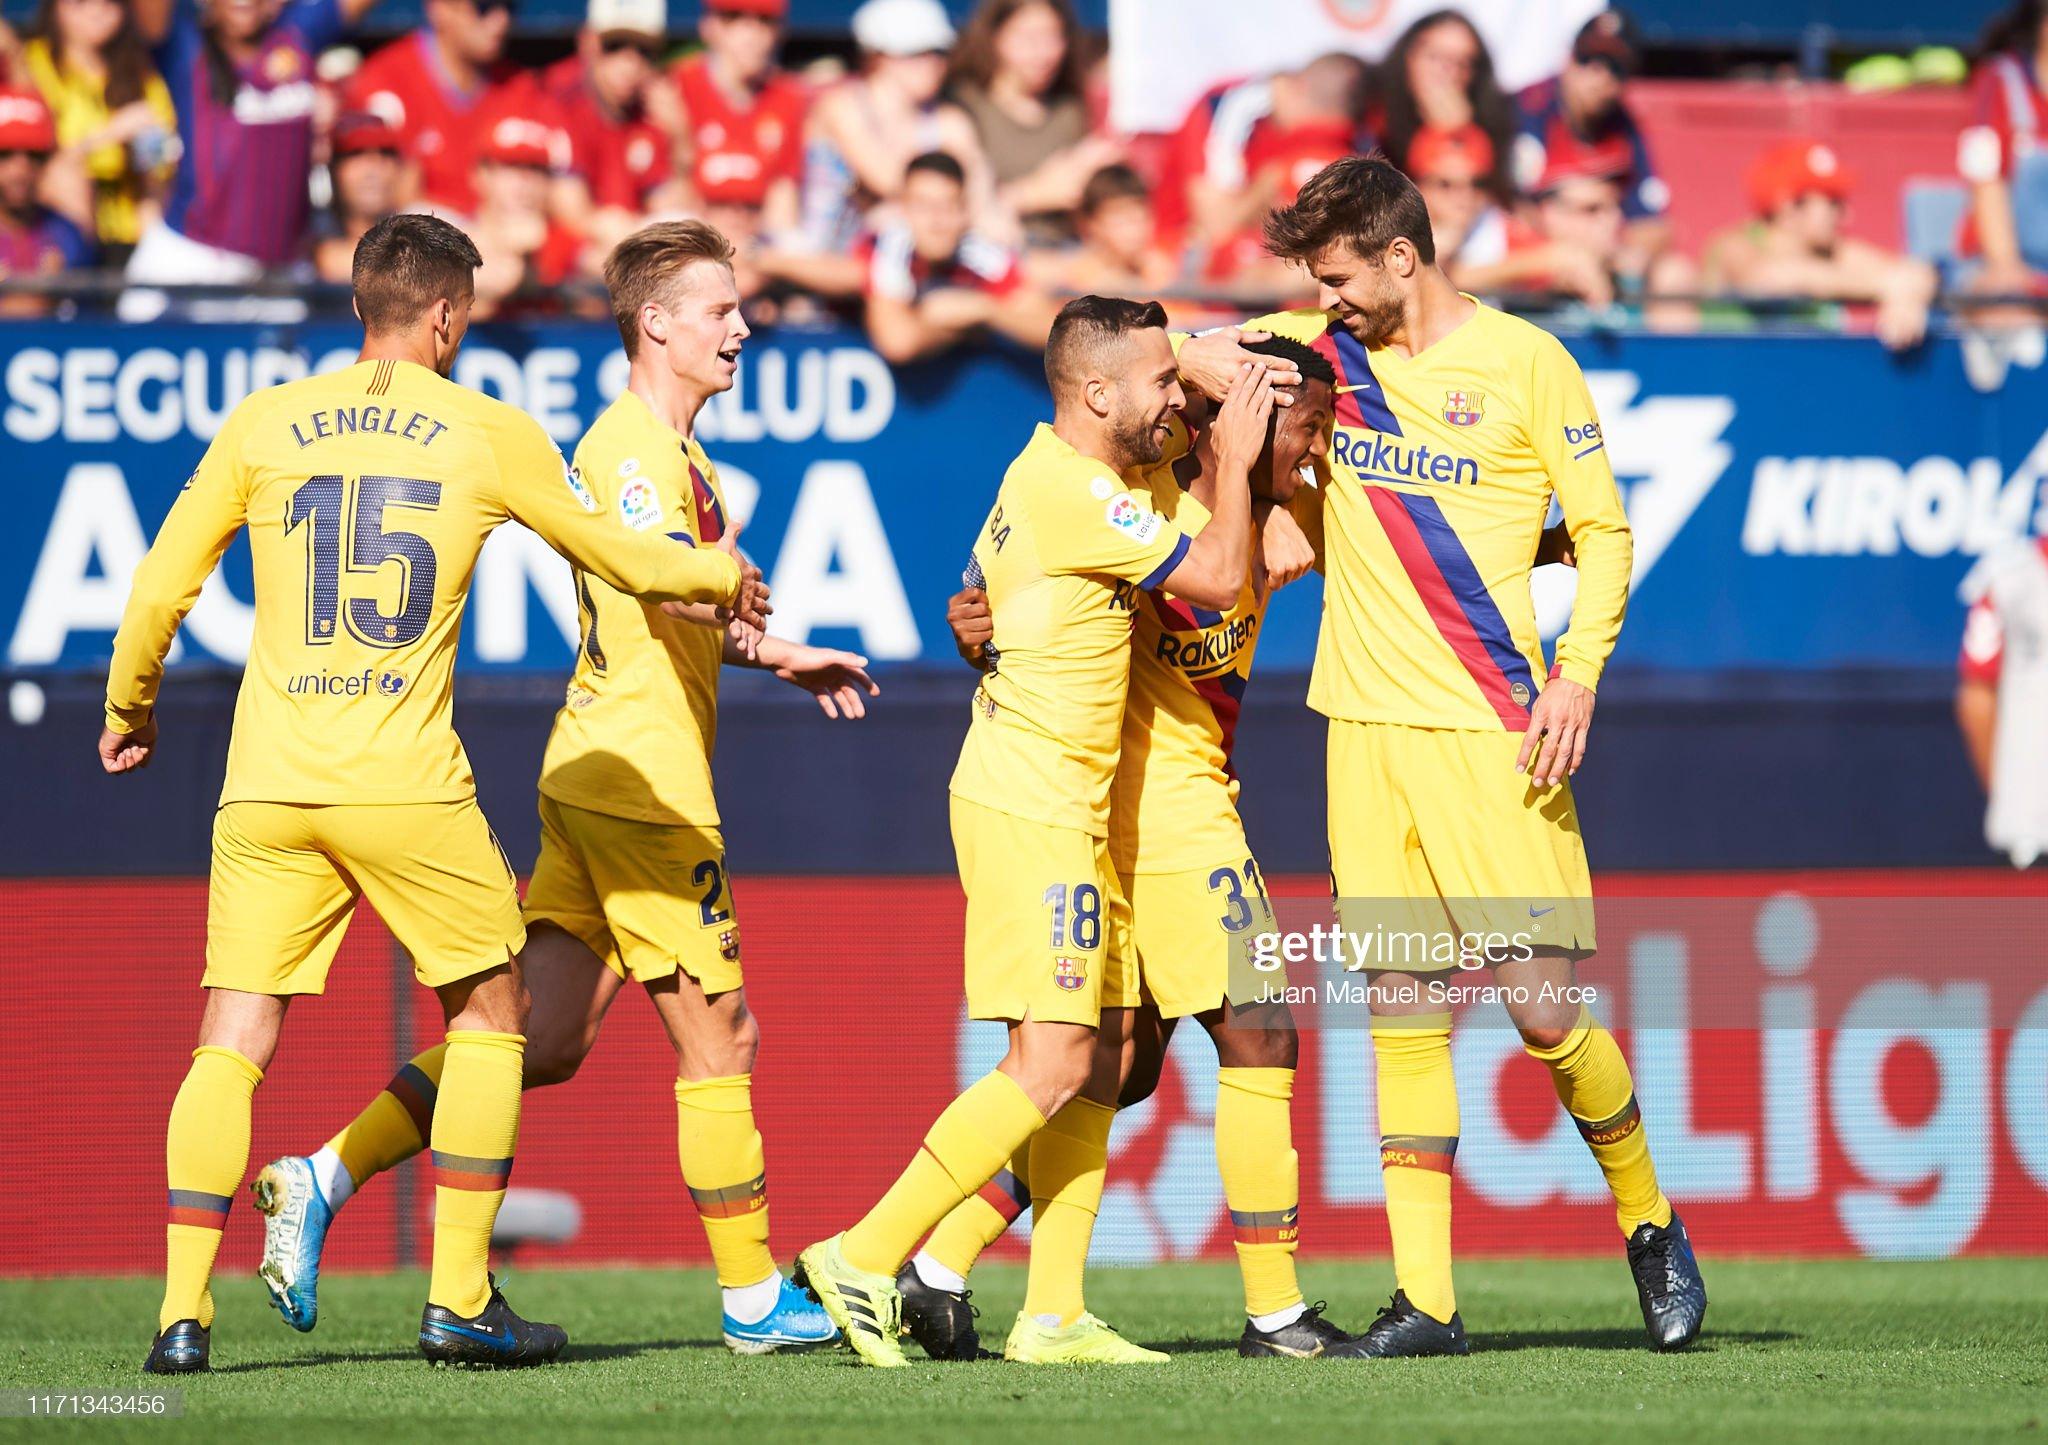 صور مباراة : أوساسونا - برشلونة 2-2 ( 31-08-2019 )  Anssumane-fati-of-fc-barcelona-celebrates-with-teammates-jordi-alba-picture-id1171343456?s=2048x2048